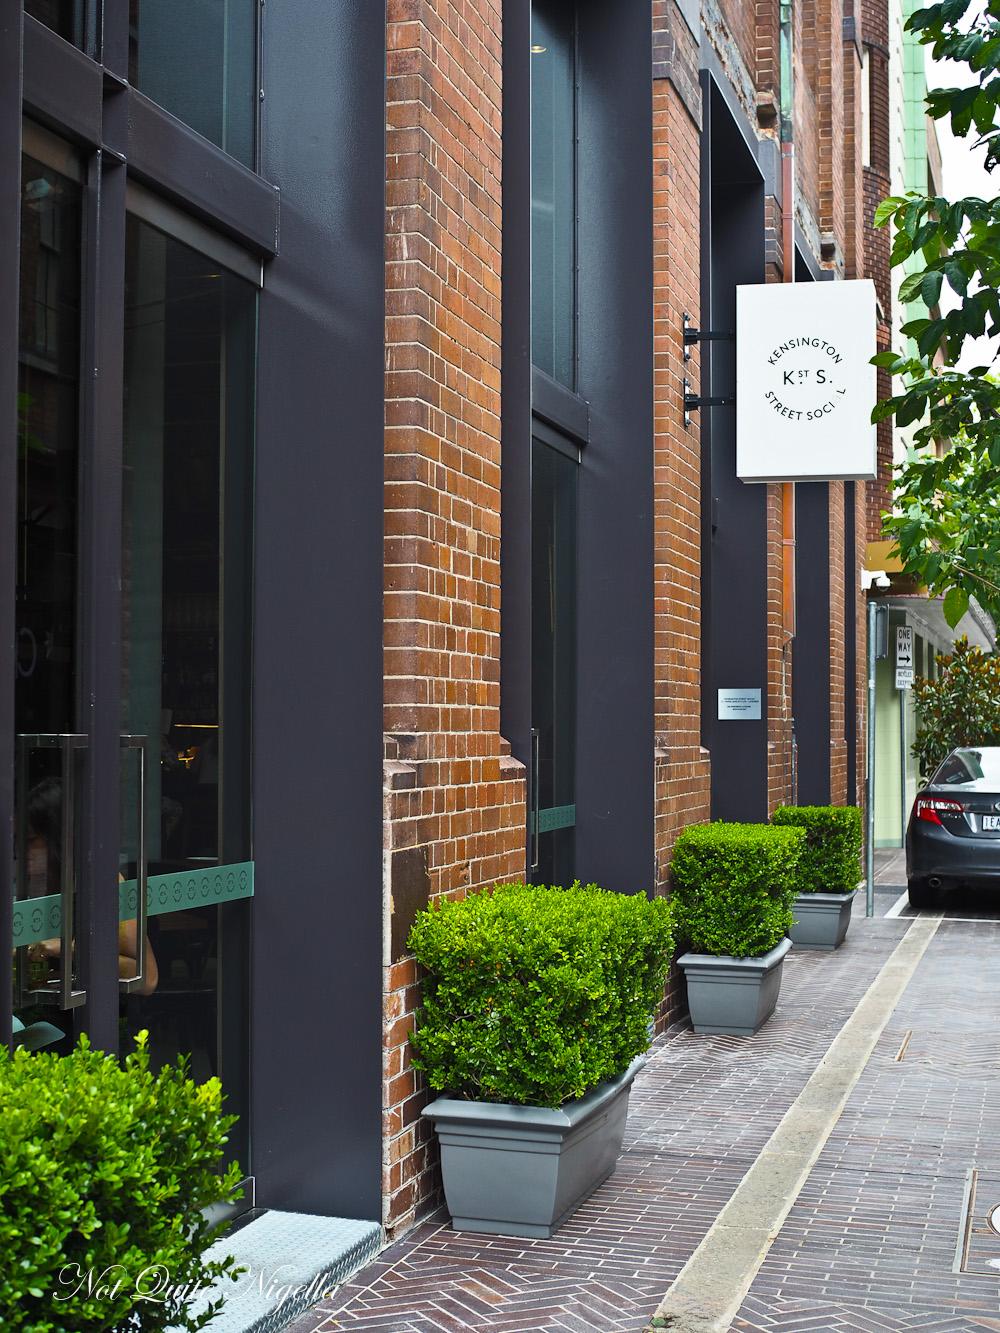 Kensington Street Social